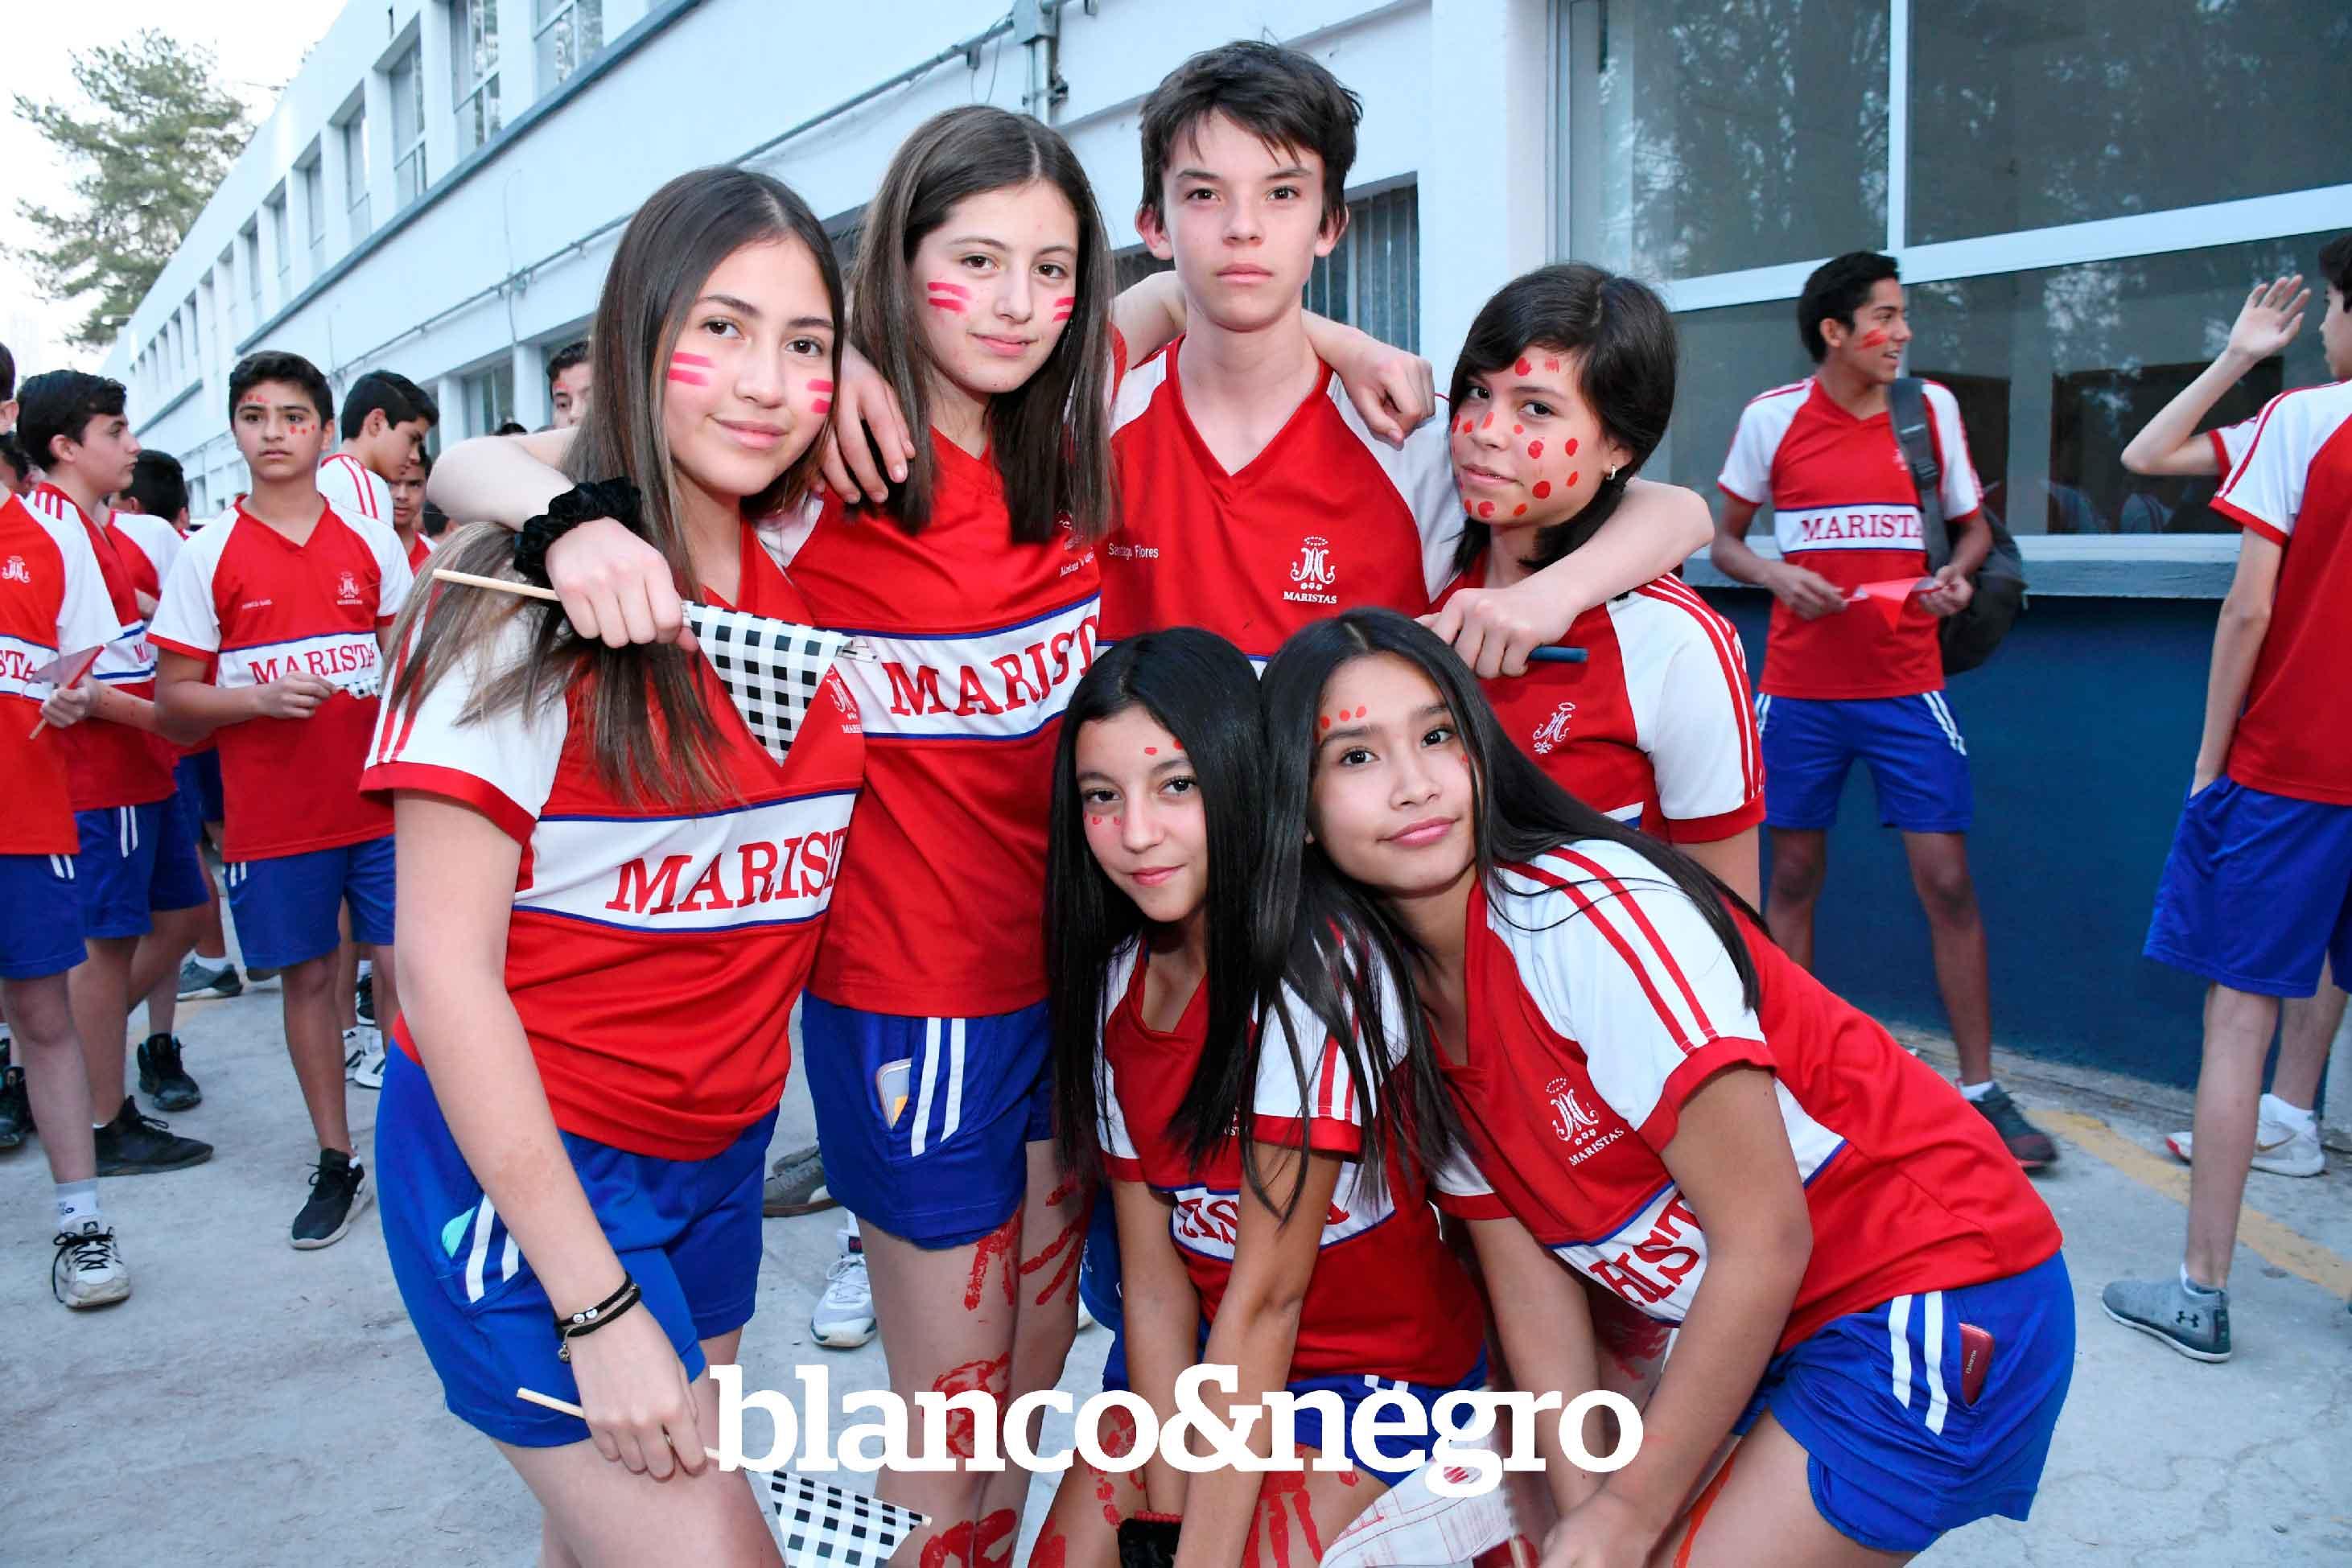 Torneo-Marista-050